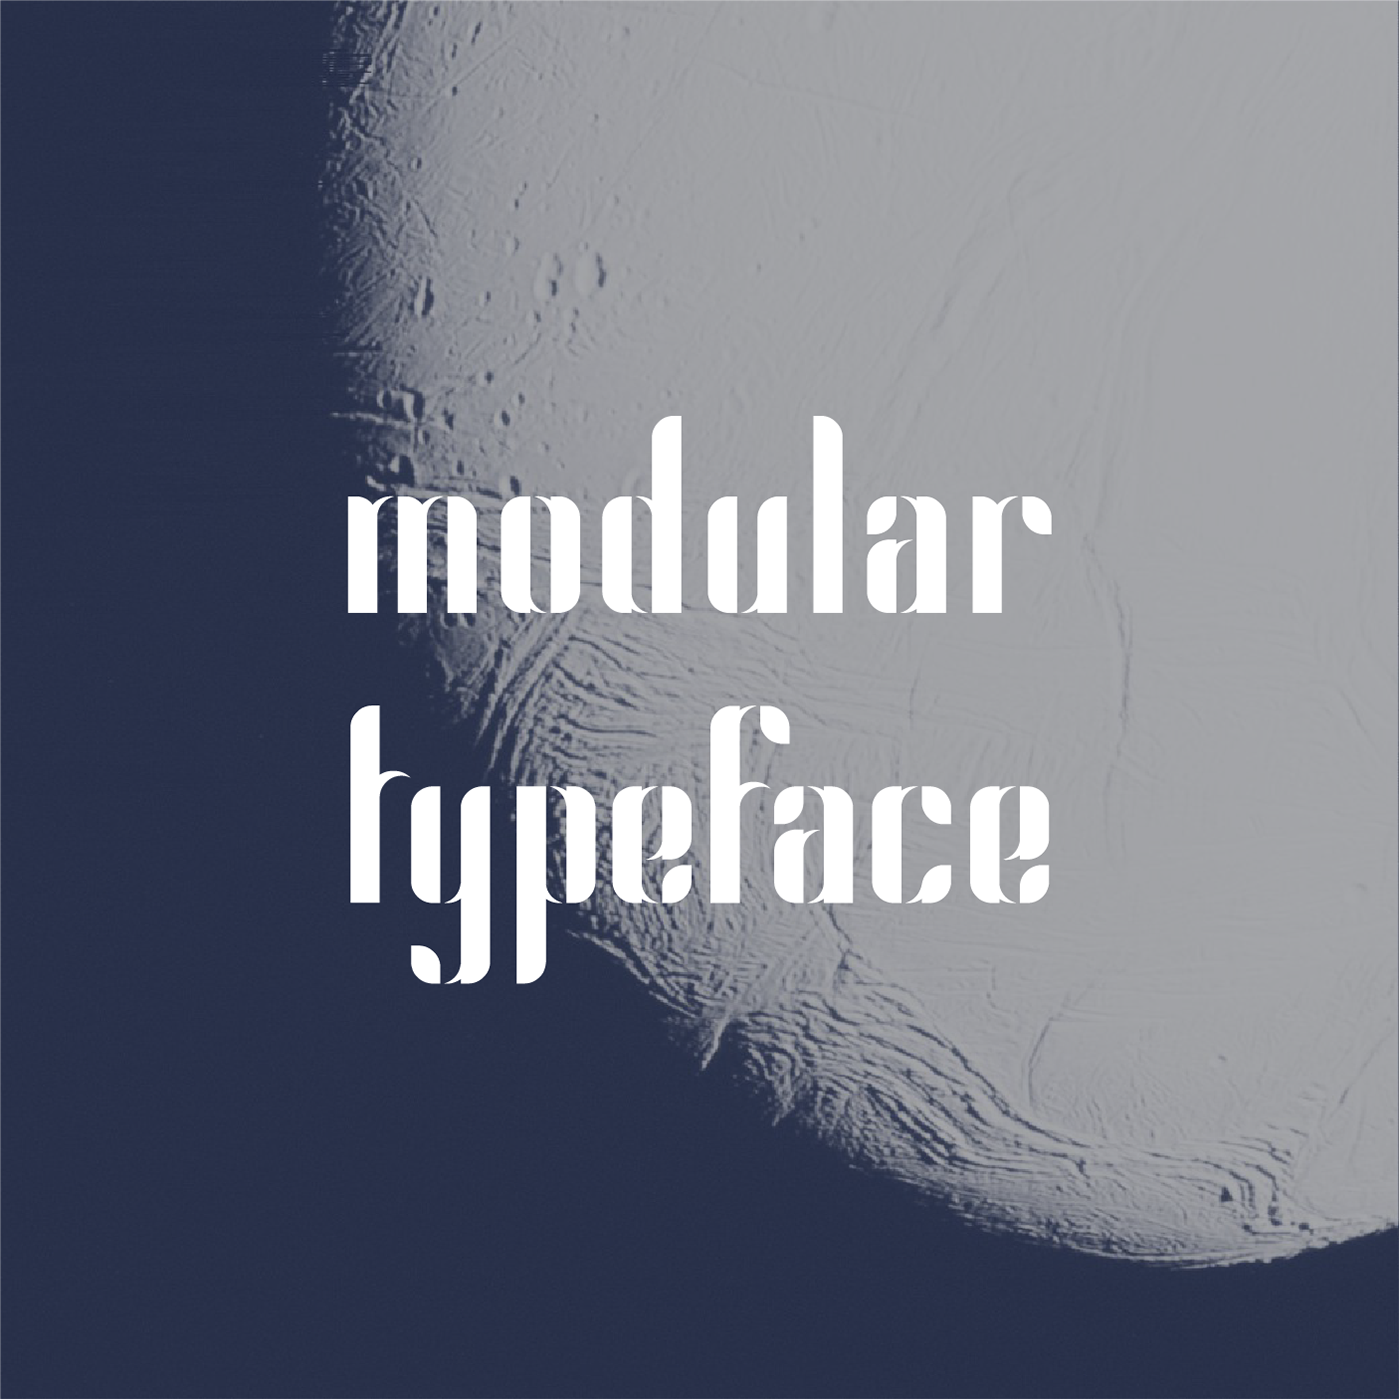 free Free font free typeface Typeface type font modular typography modular Modular Typeface SerraiAbella